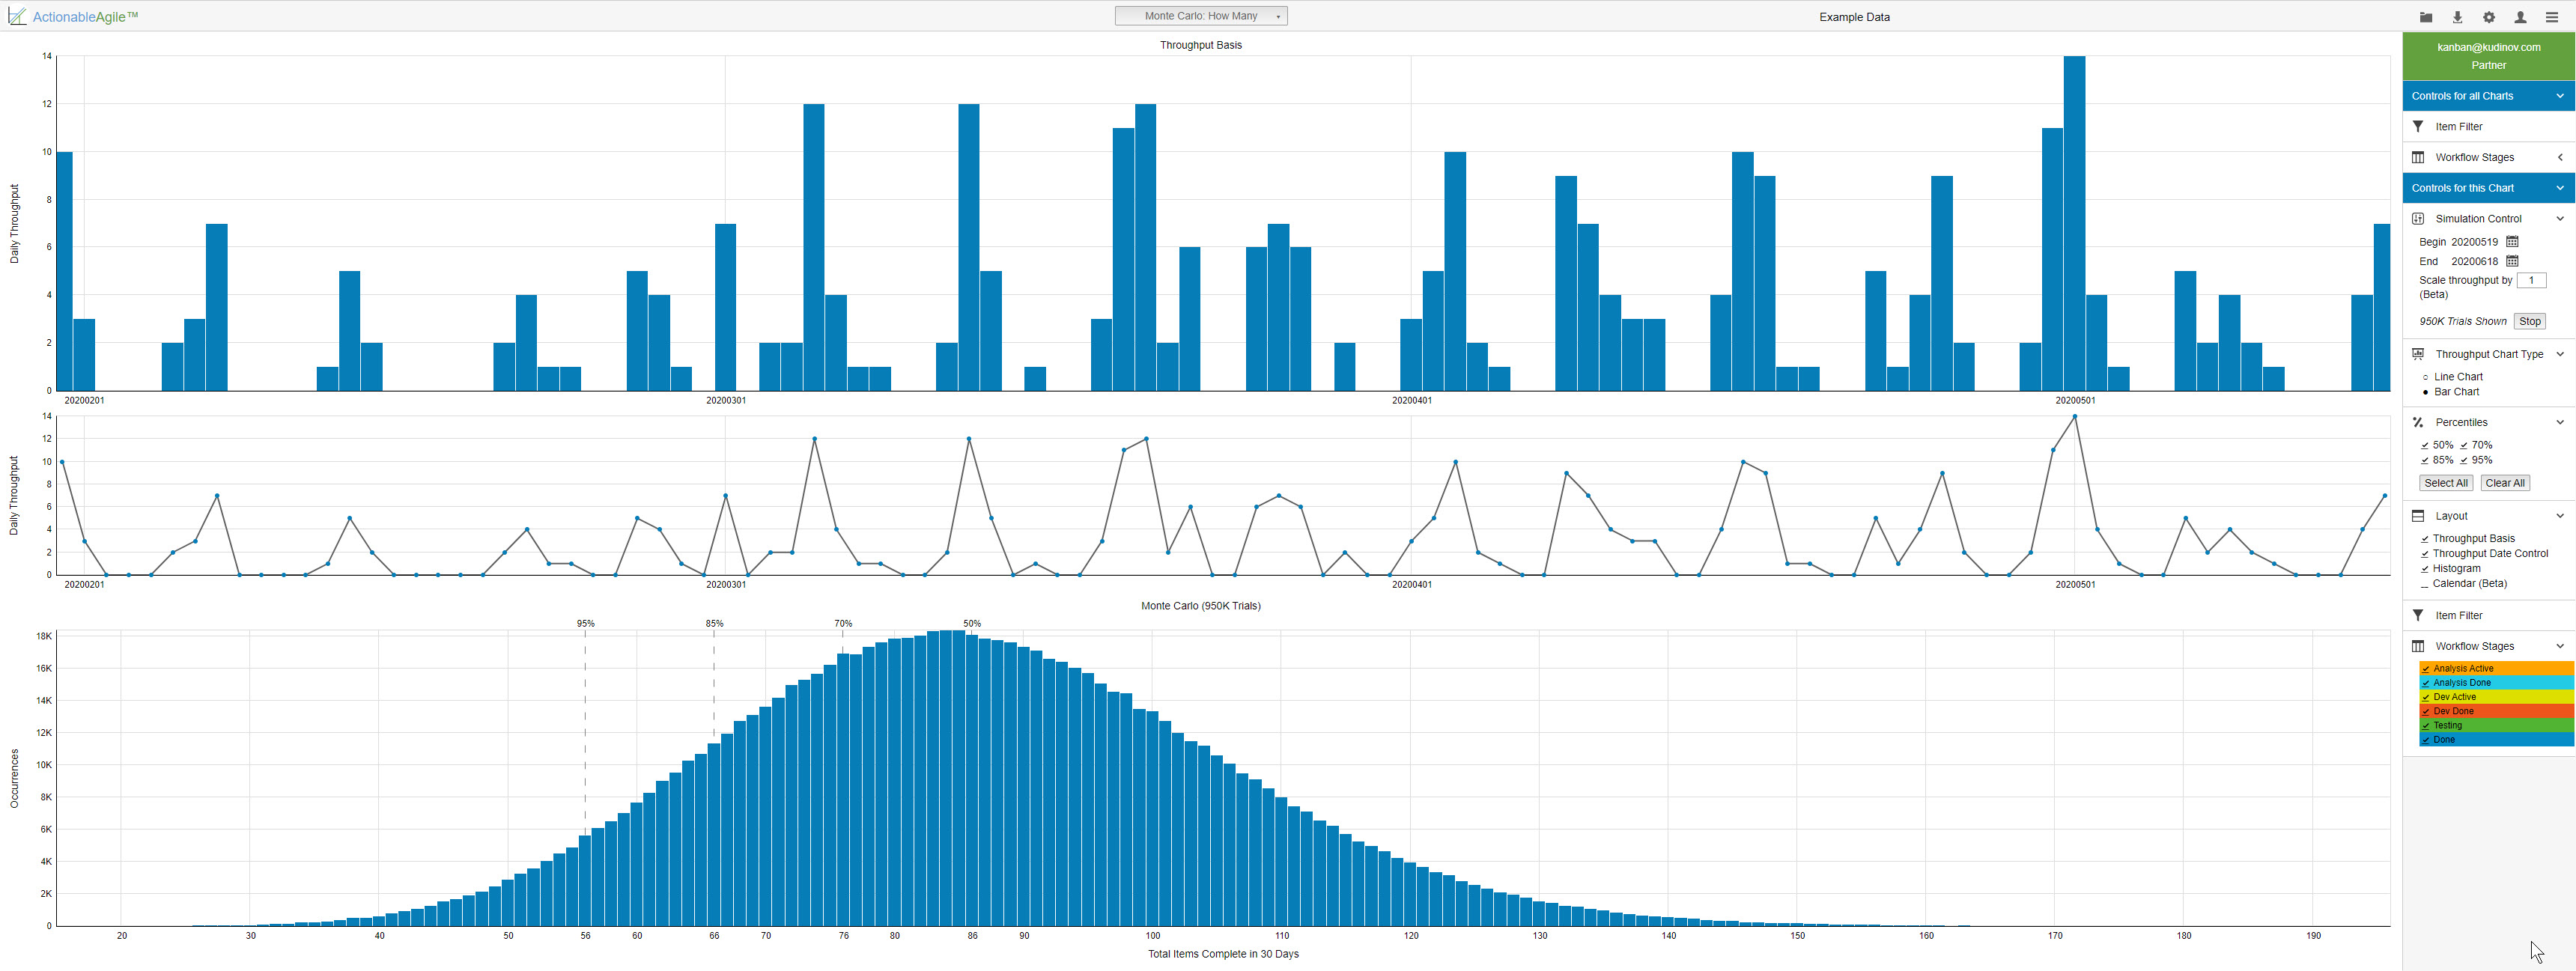 Agile Metrics - Monte Carlo - How Many